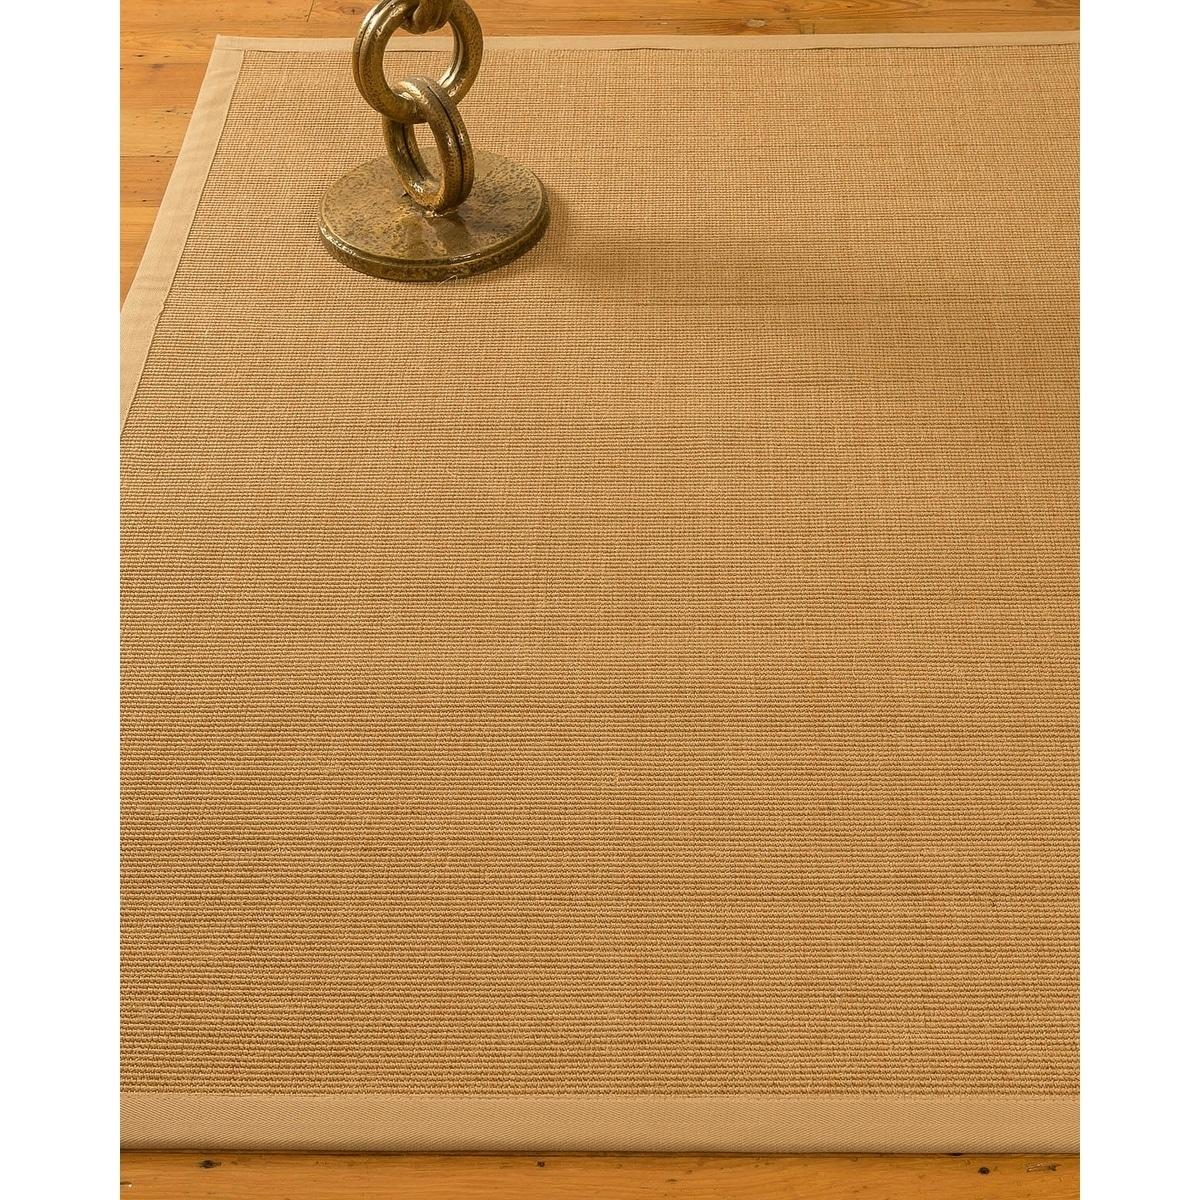 Natural Area Handmade Shiasta Sisal Beige Rug (4'x6') wit...